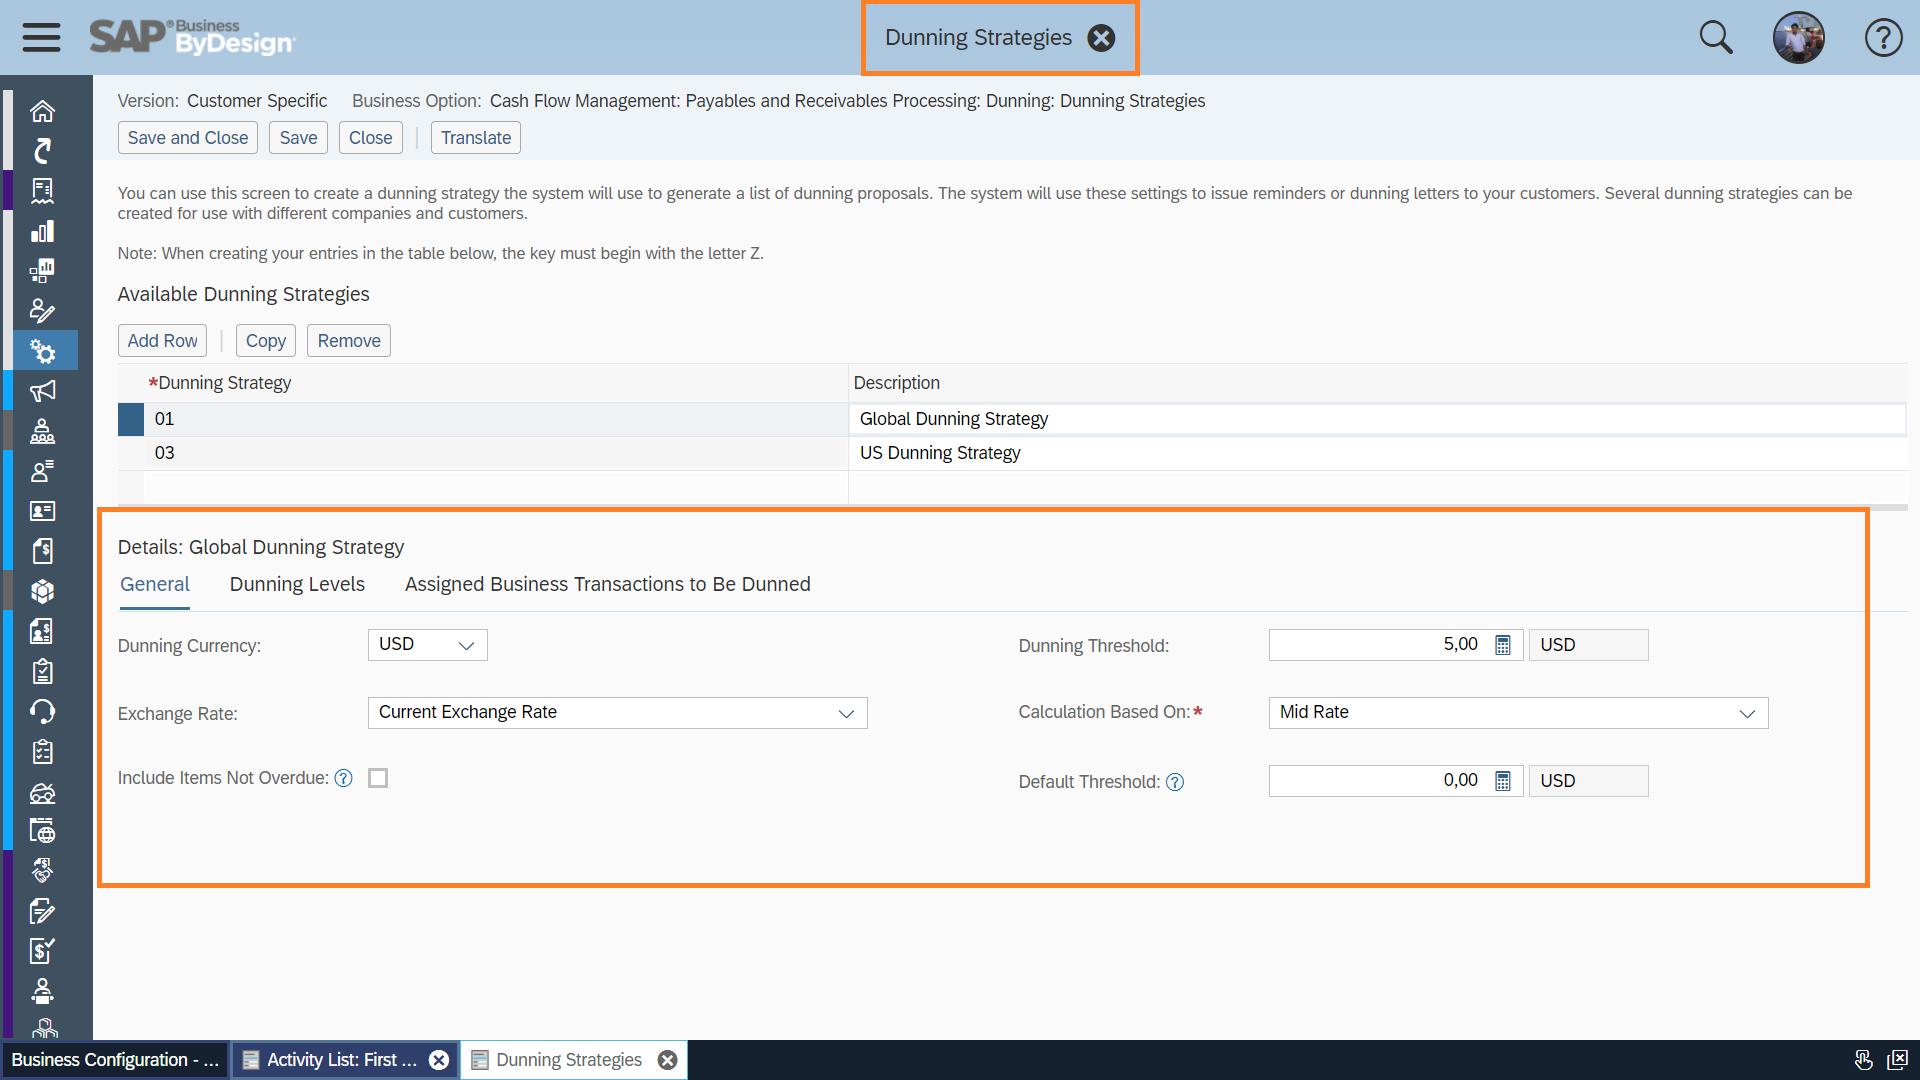 Dunning in SAP Business ByDesign | SAP Blogs